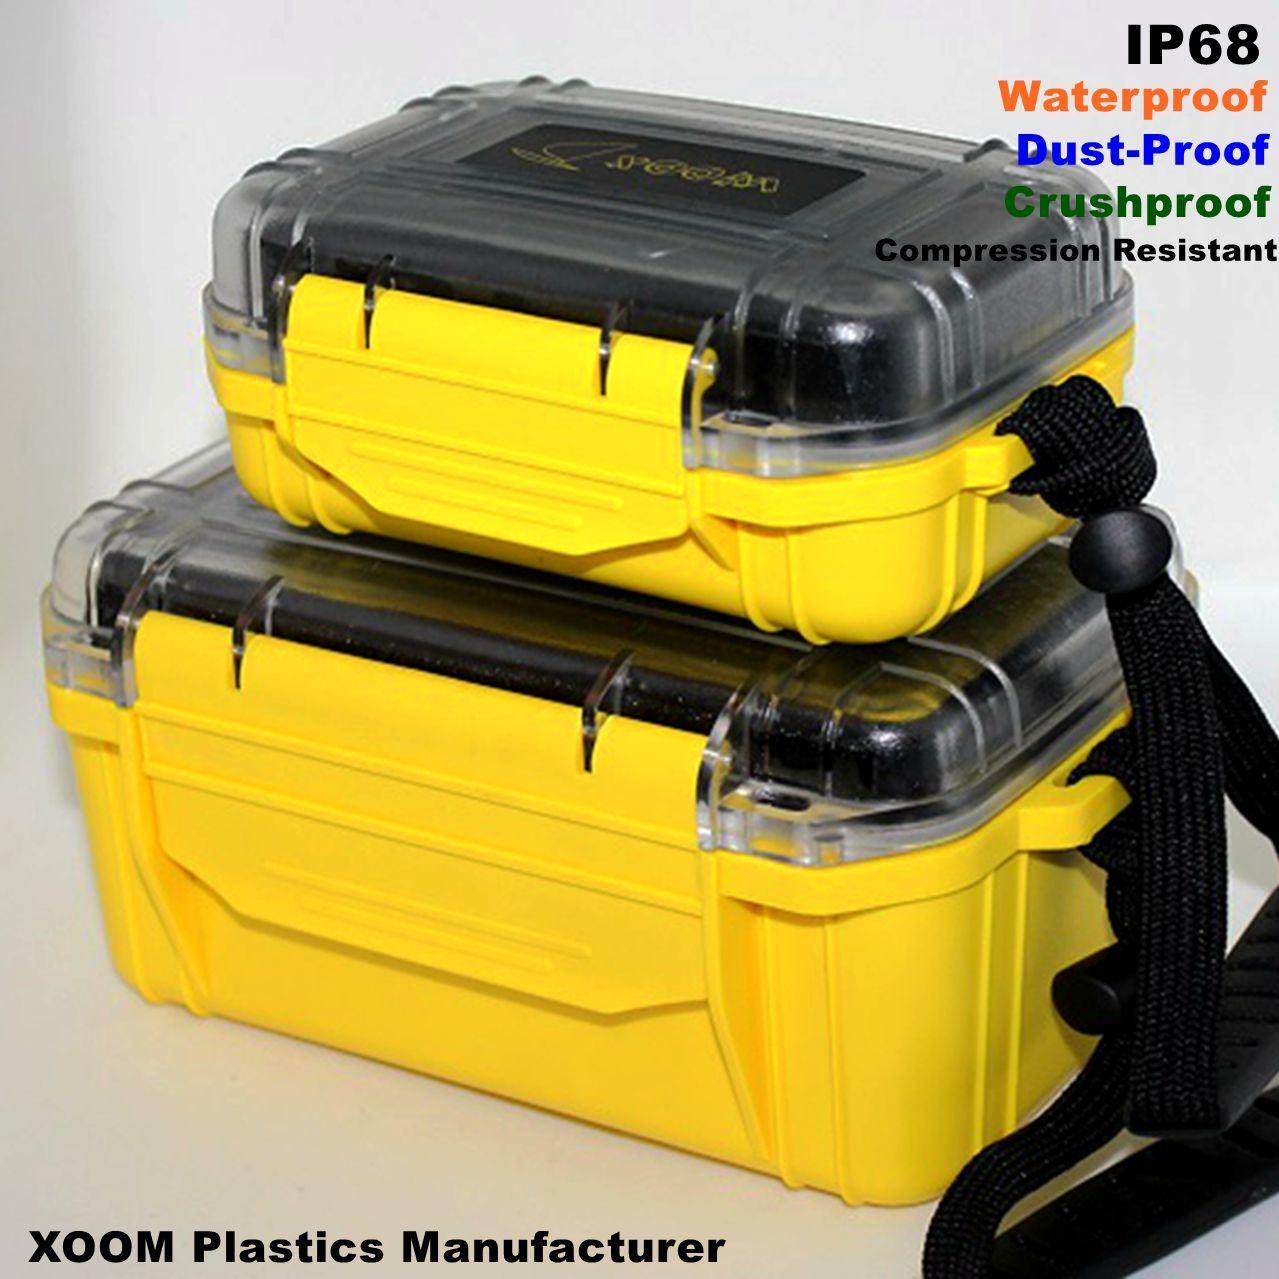 Outdoor Equipment Gift Set--Small Waterproof Plastic Box